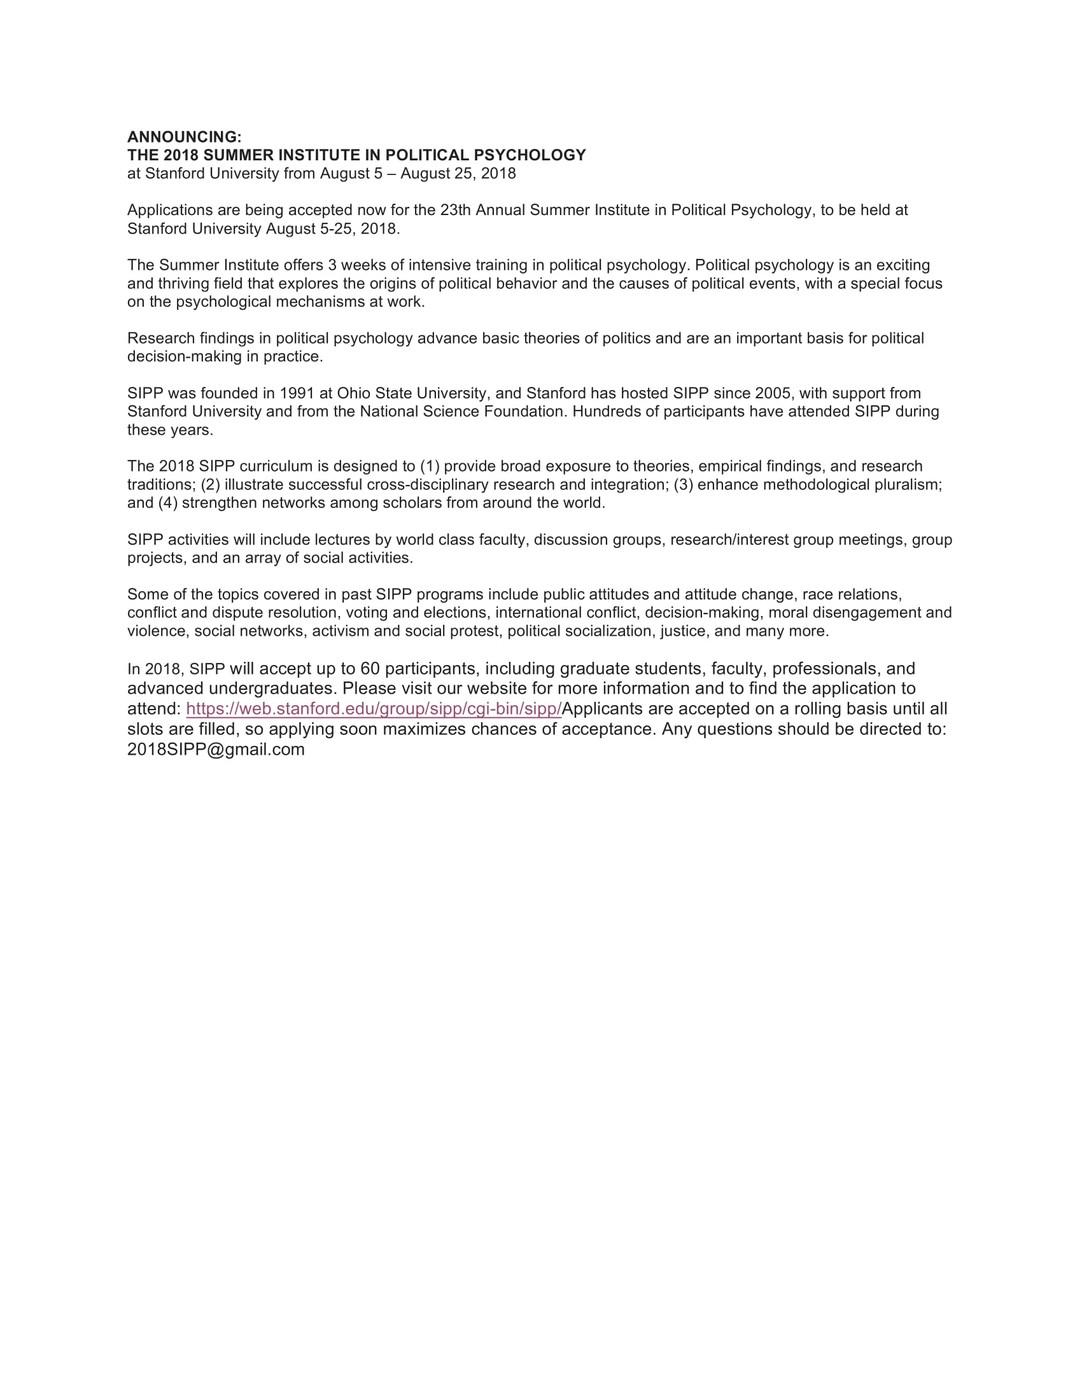 Opportunities BONANZA | Smore Newsletters